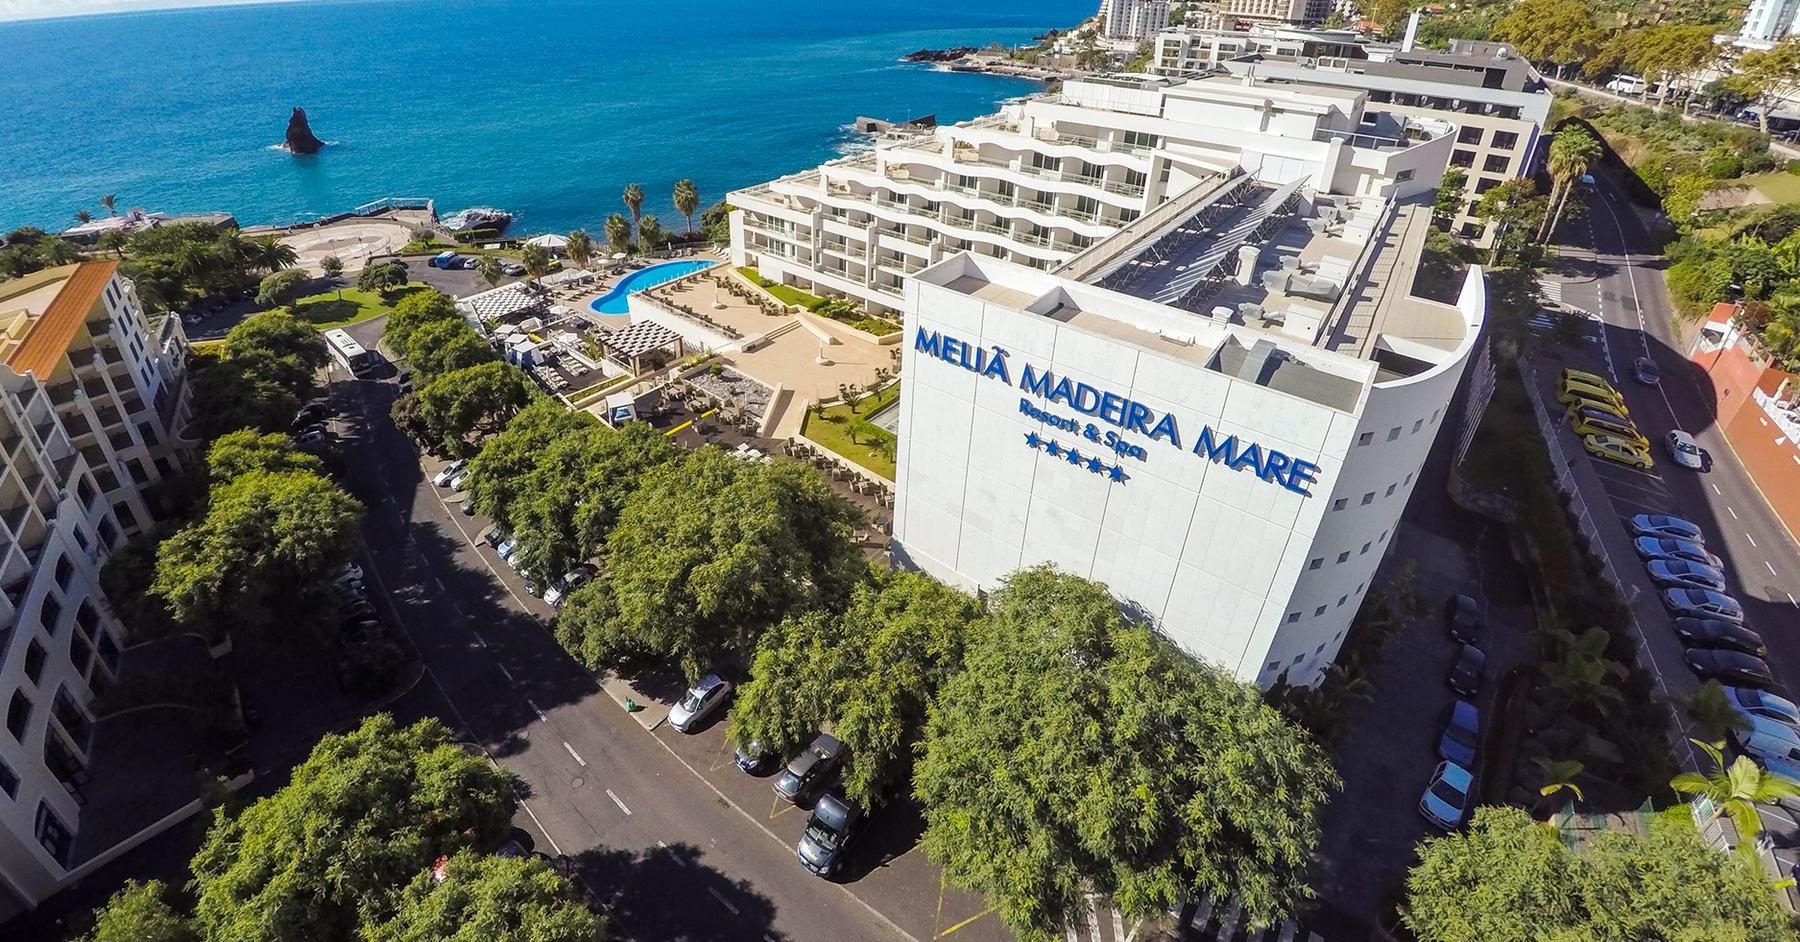 Meliá Madeira Mare Resort & Spa PressReader